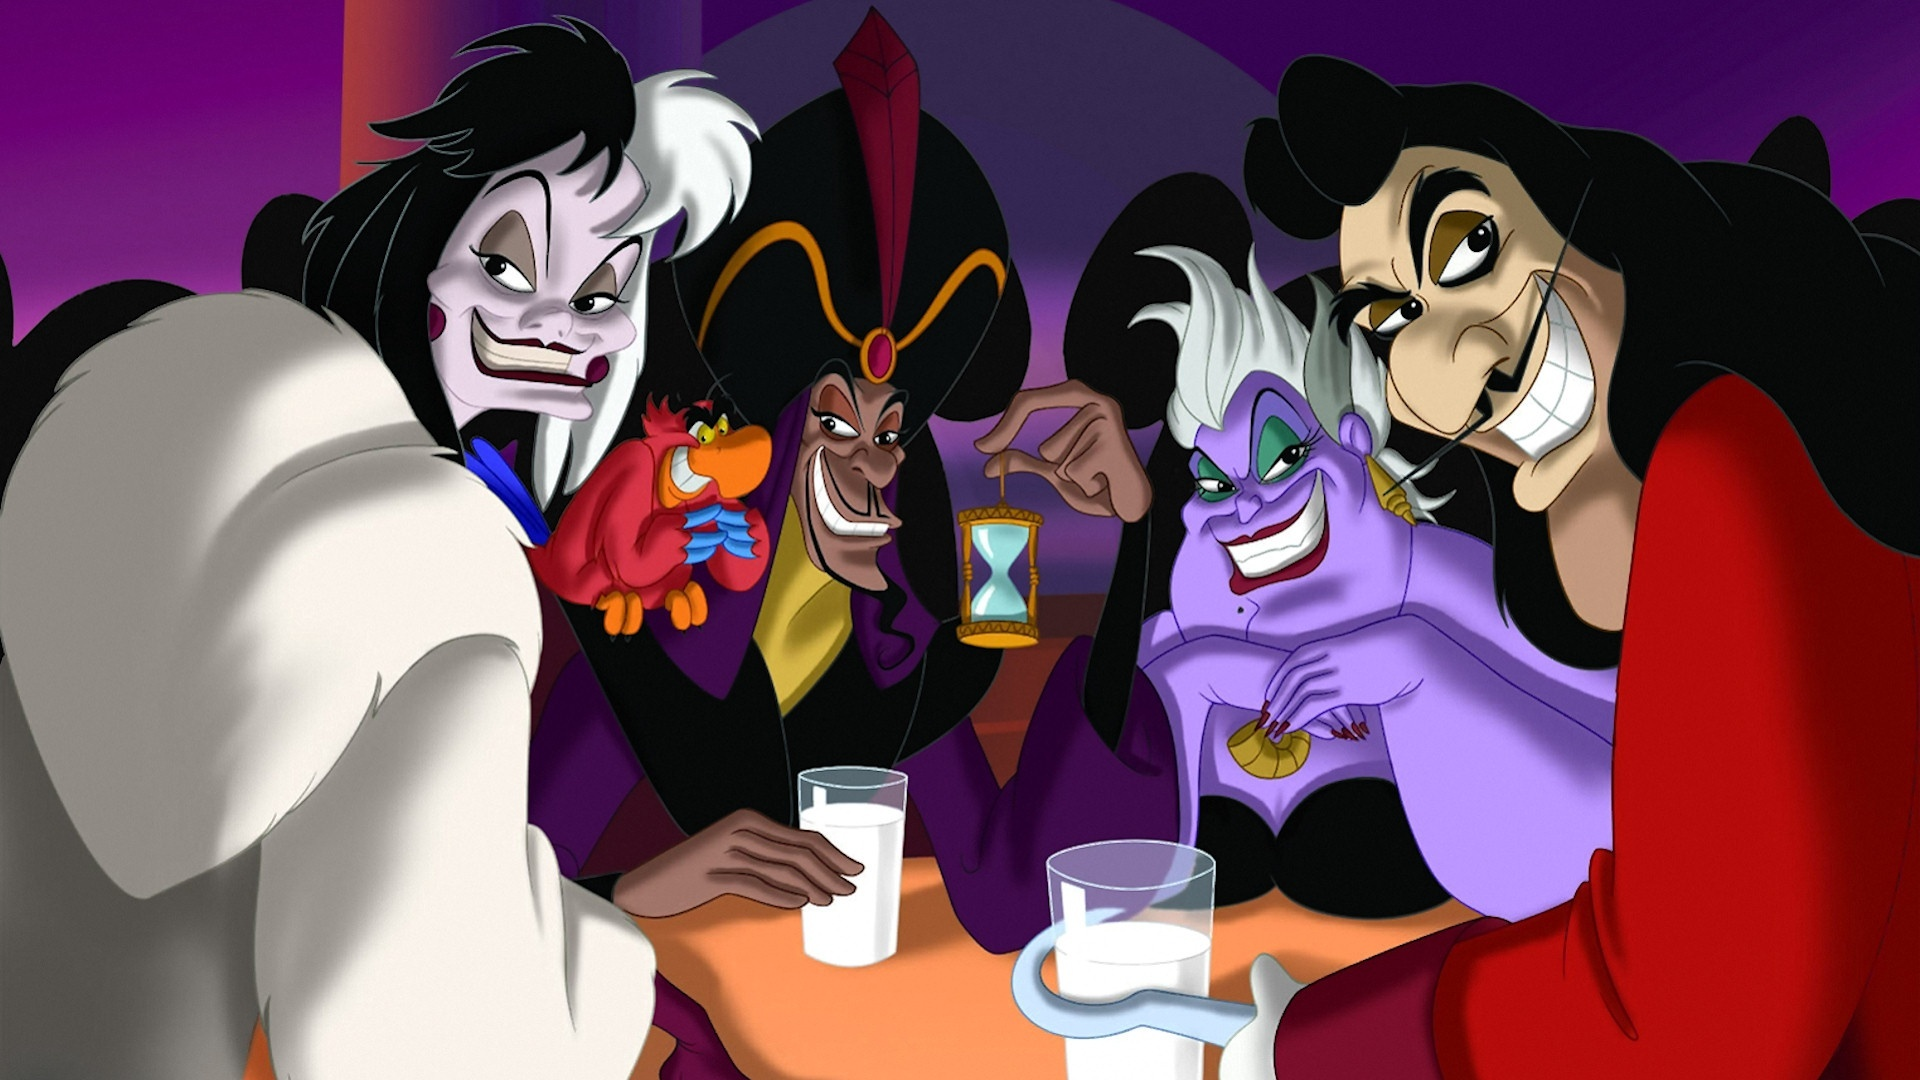 Disney Villain HD Wallpaper And Background 9678 Wallur.jpg background picture